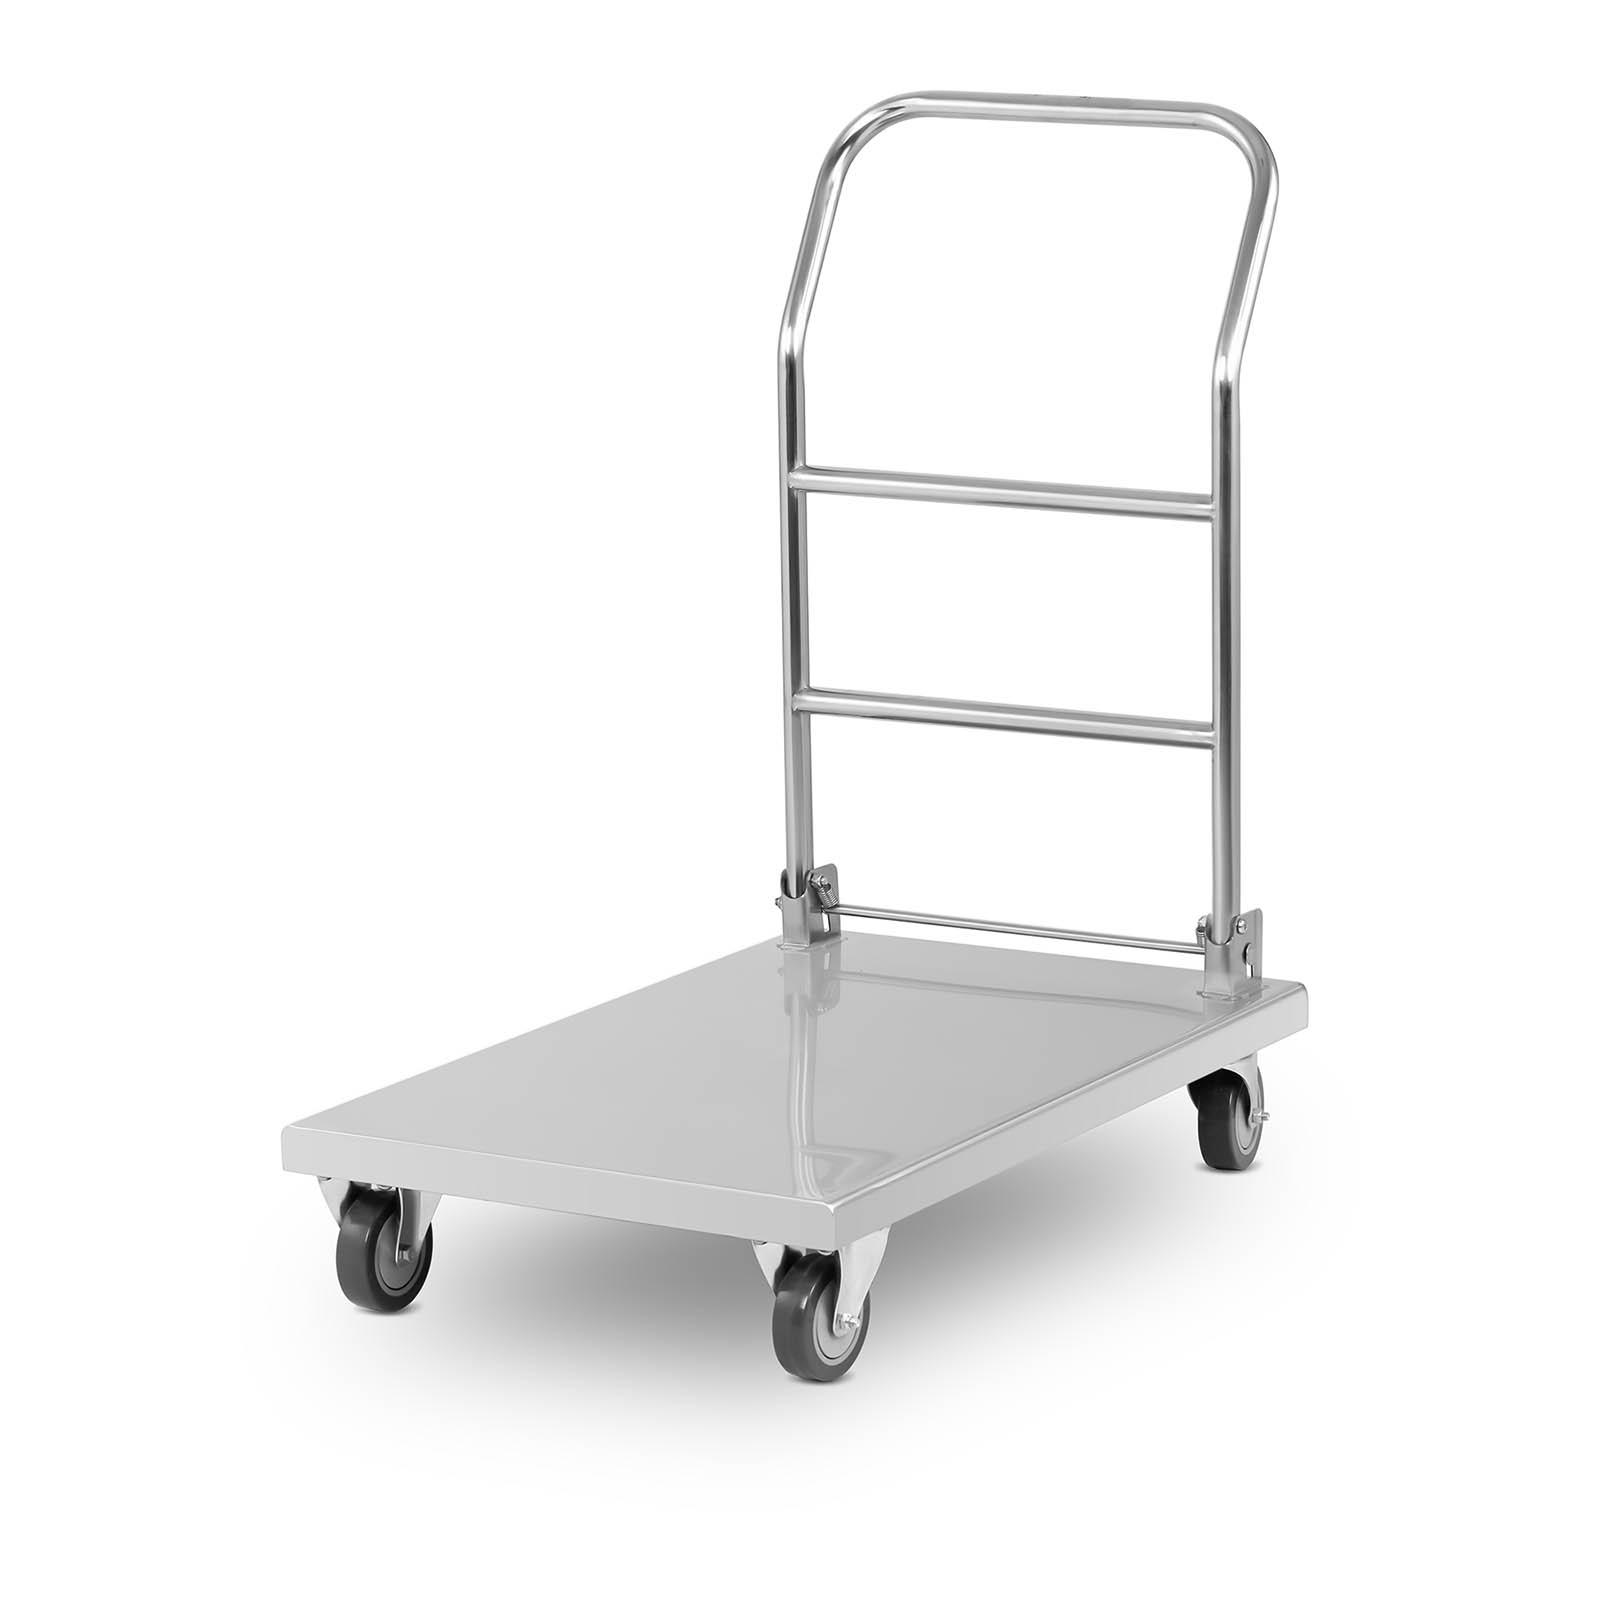 neu edelstahl transportwagen handwagen plattformwagen rollwagen klappwagen 330kg. Black Bedroom Furniture Sets. Home Design Ideas